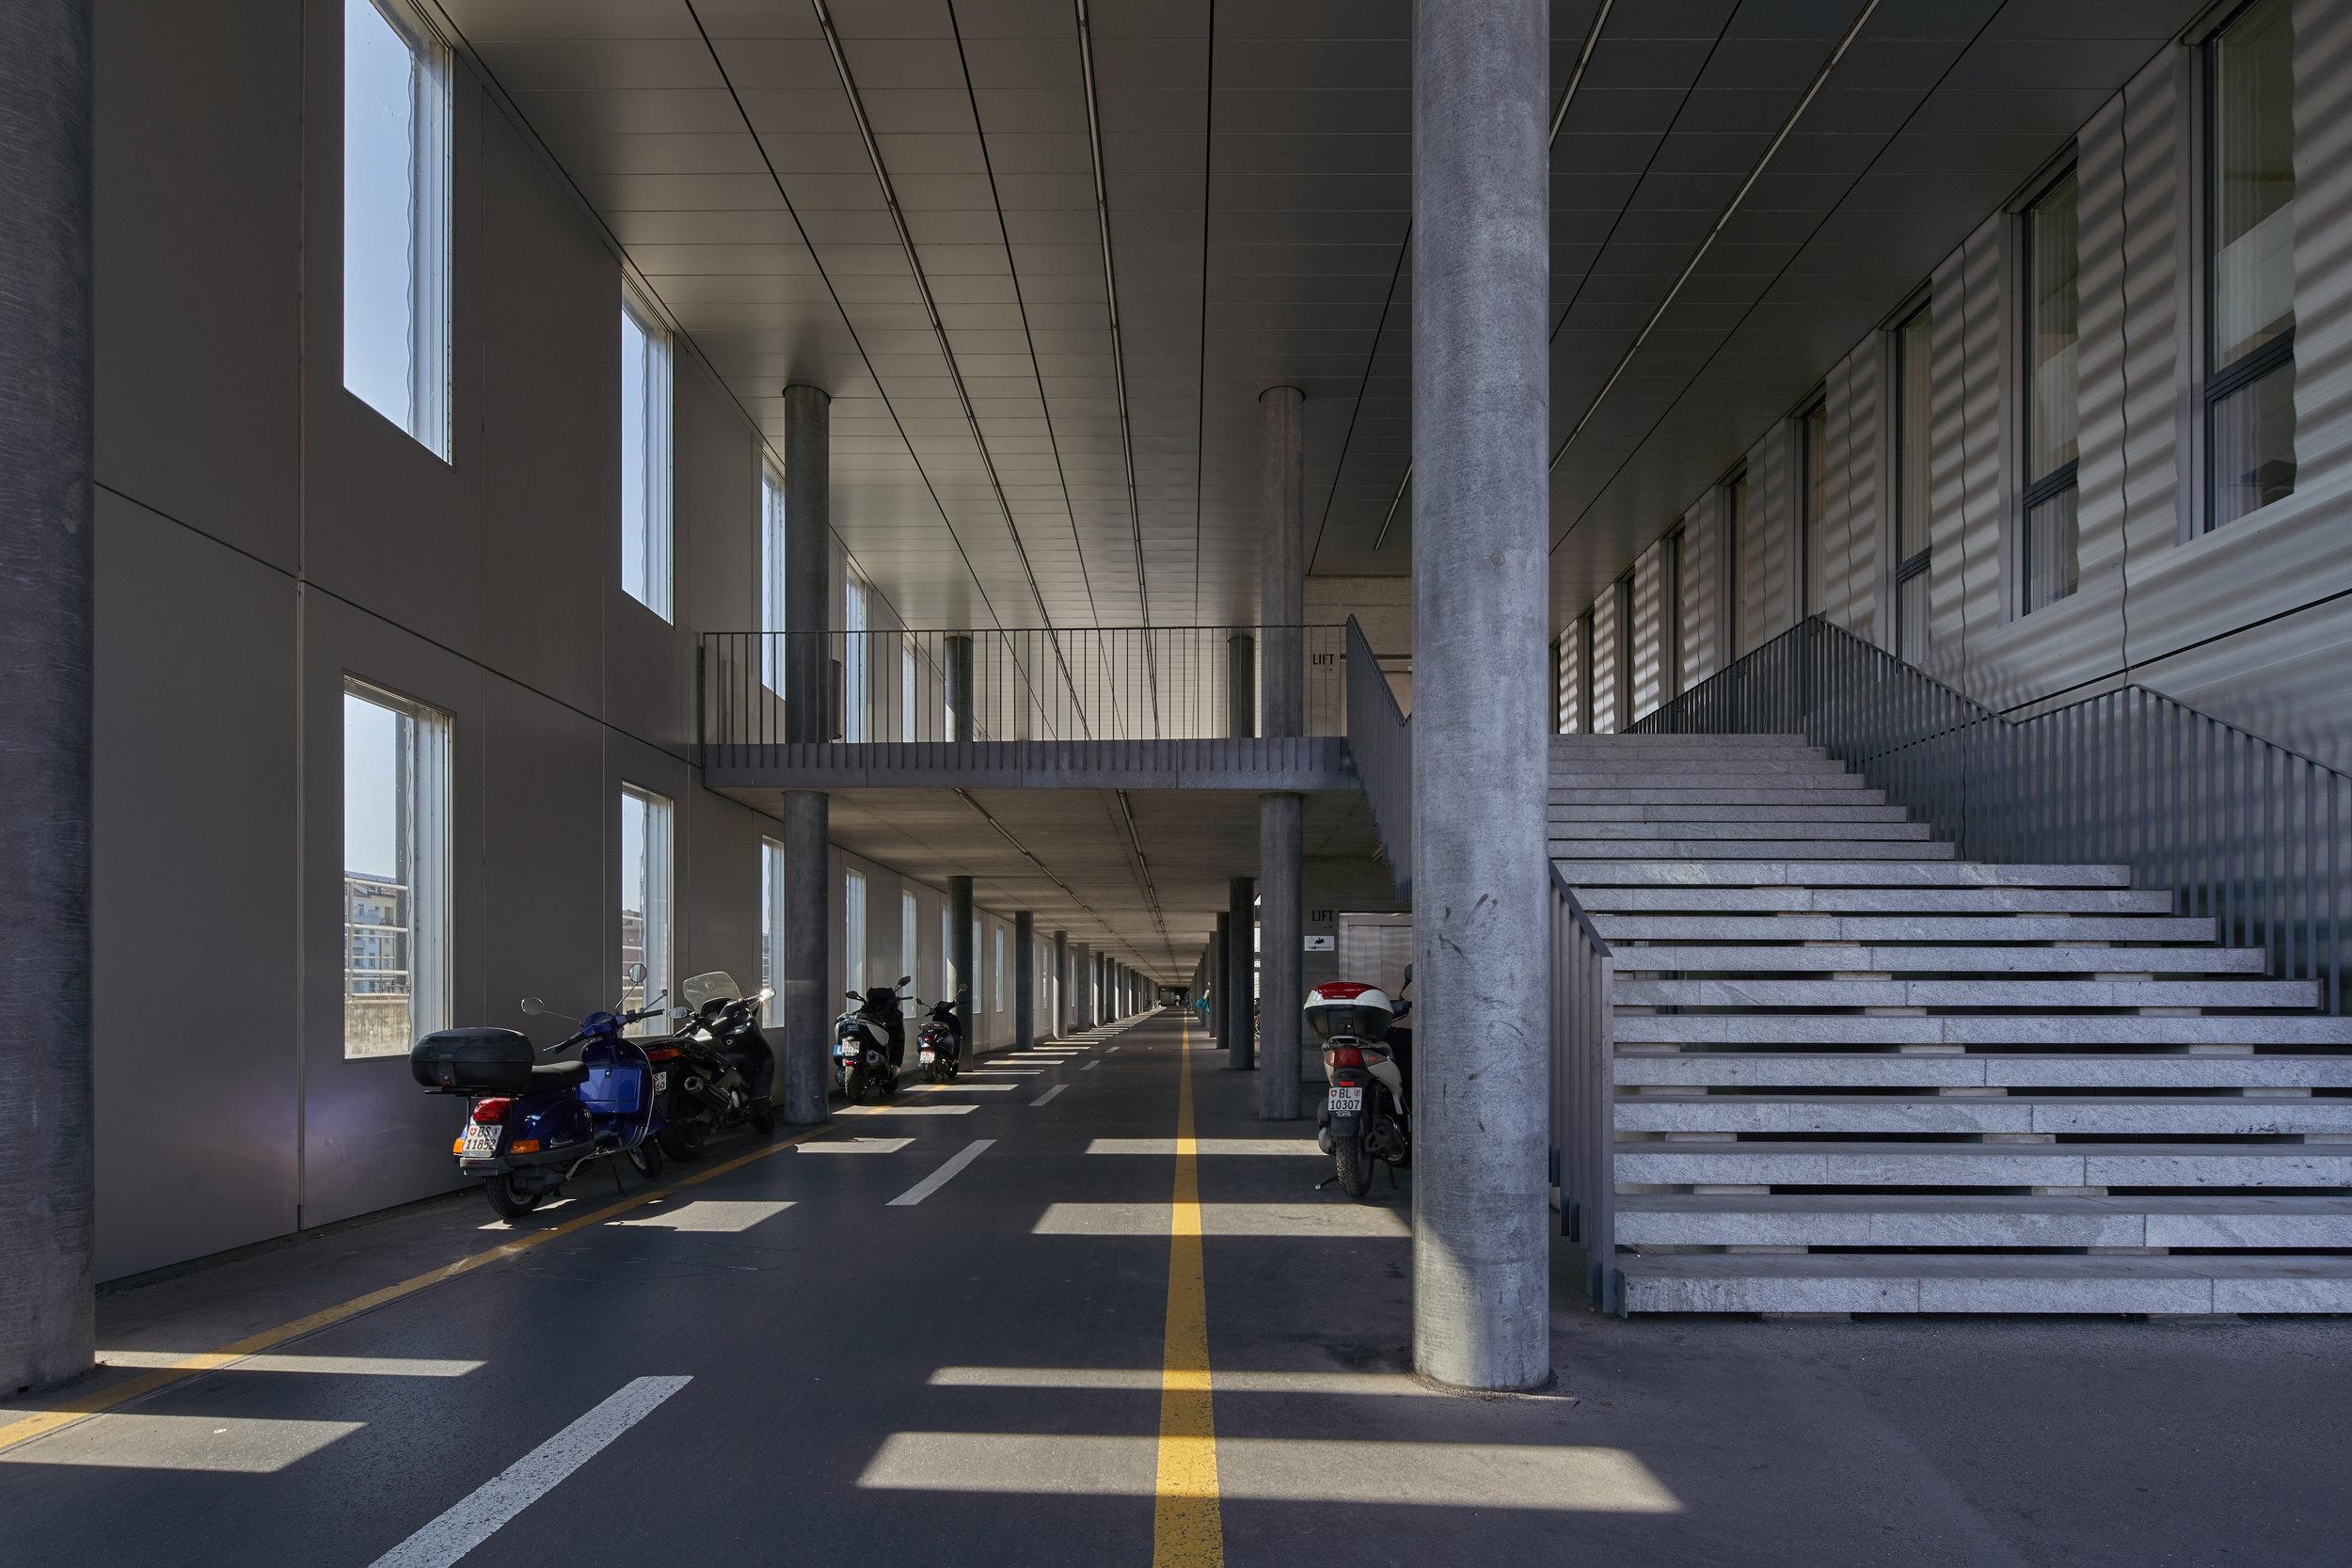 bikeroad tunnel.jpg